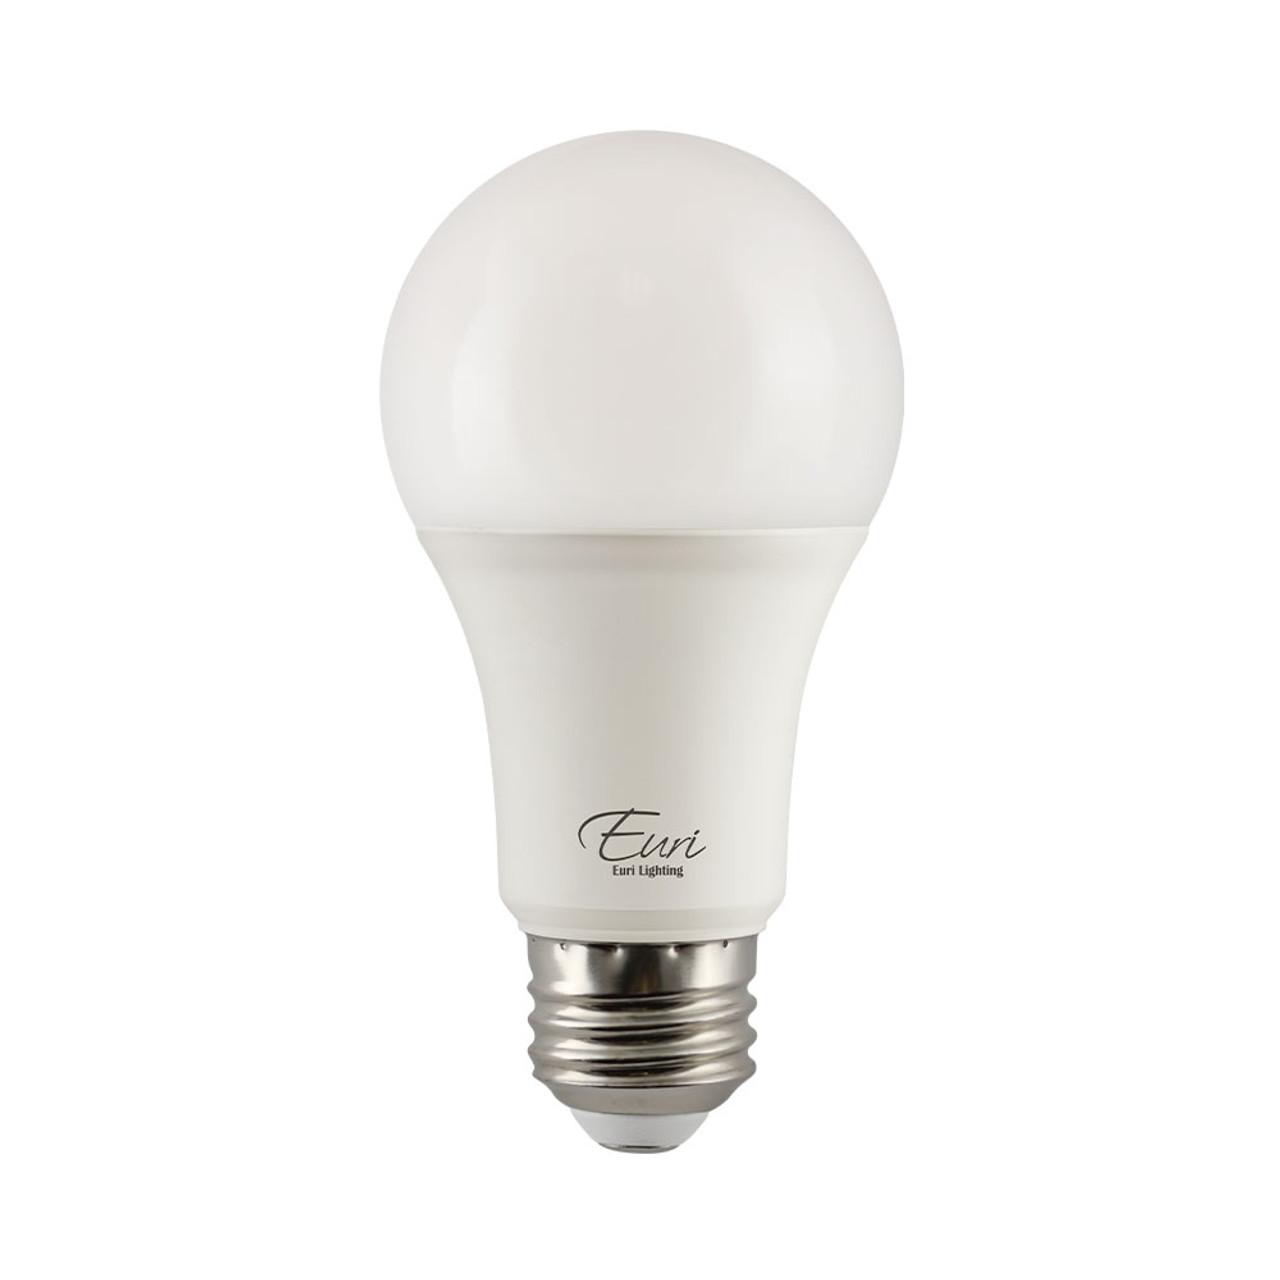 A19, Omni-Directional, LED Light Bulb, Dimmable, 15 W, 120 V, 1600 lm, 2700 K, E26 Base (EA19-15W2020e)